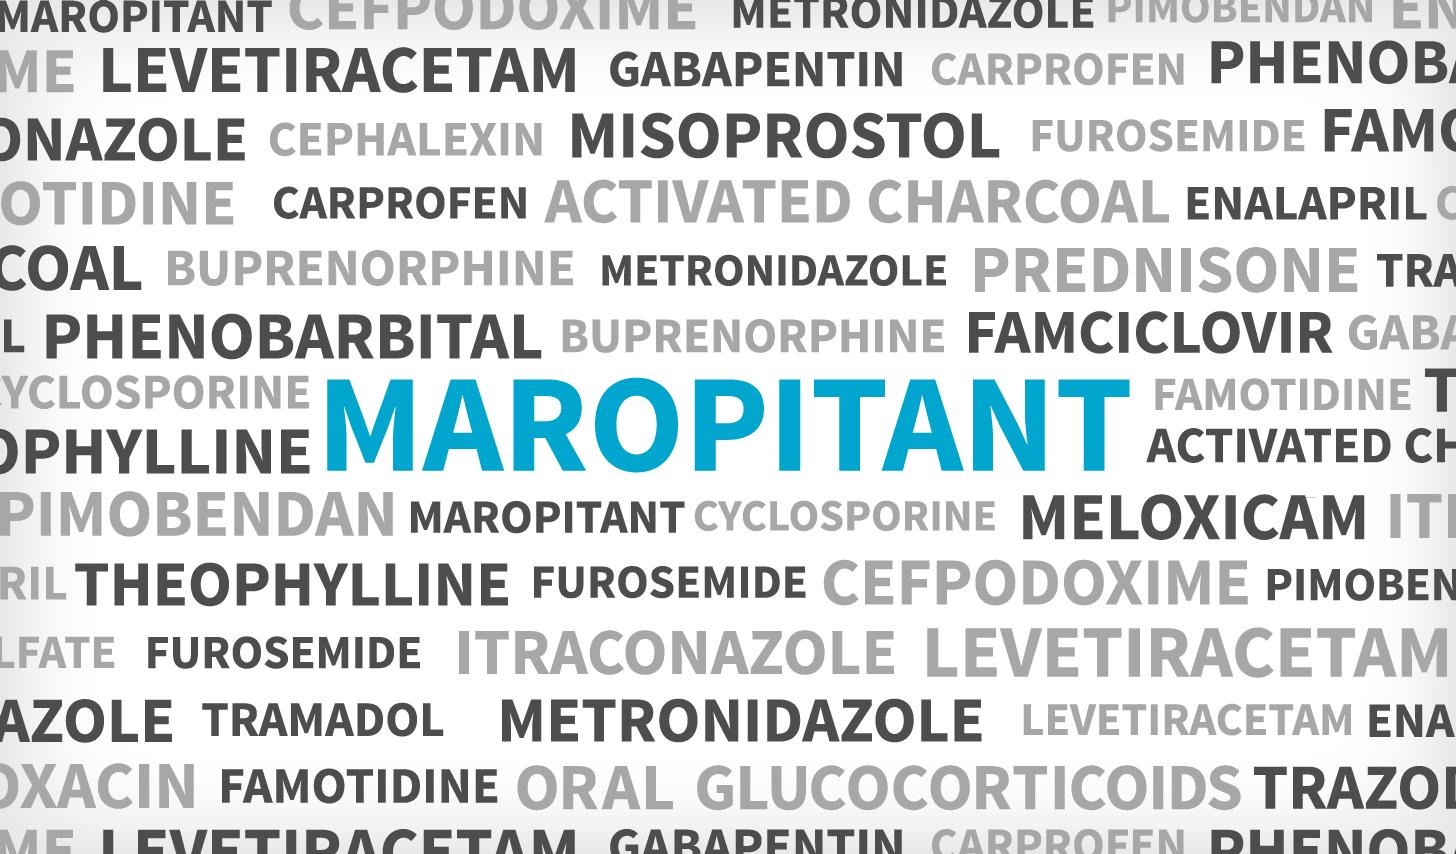 Maropitant